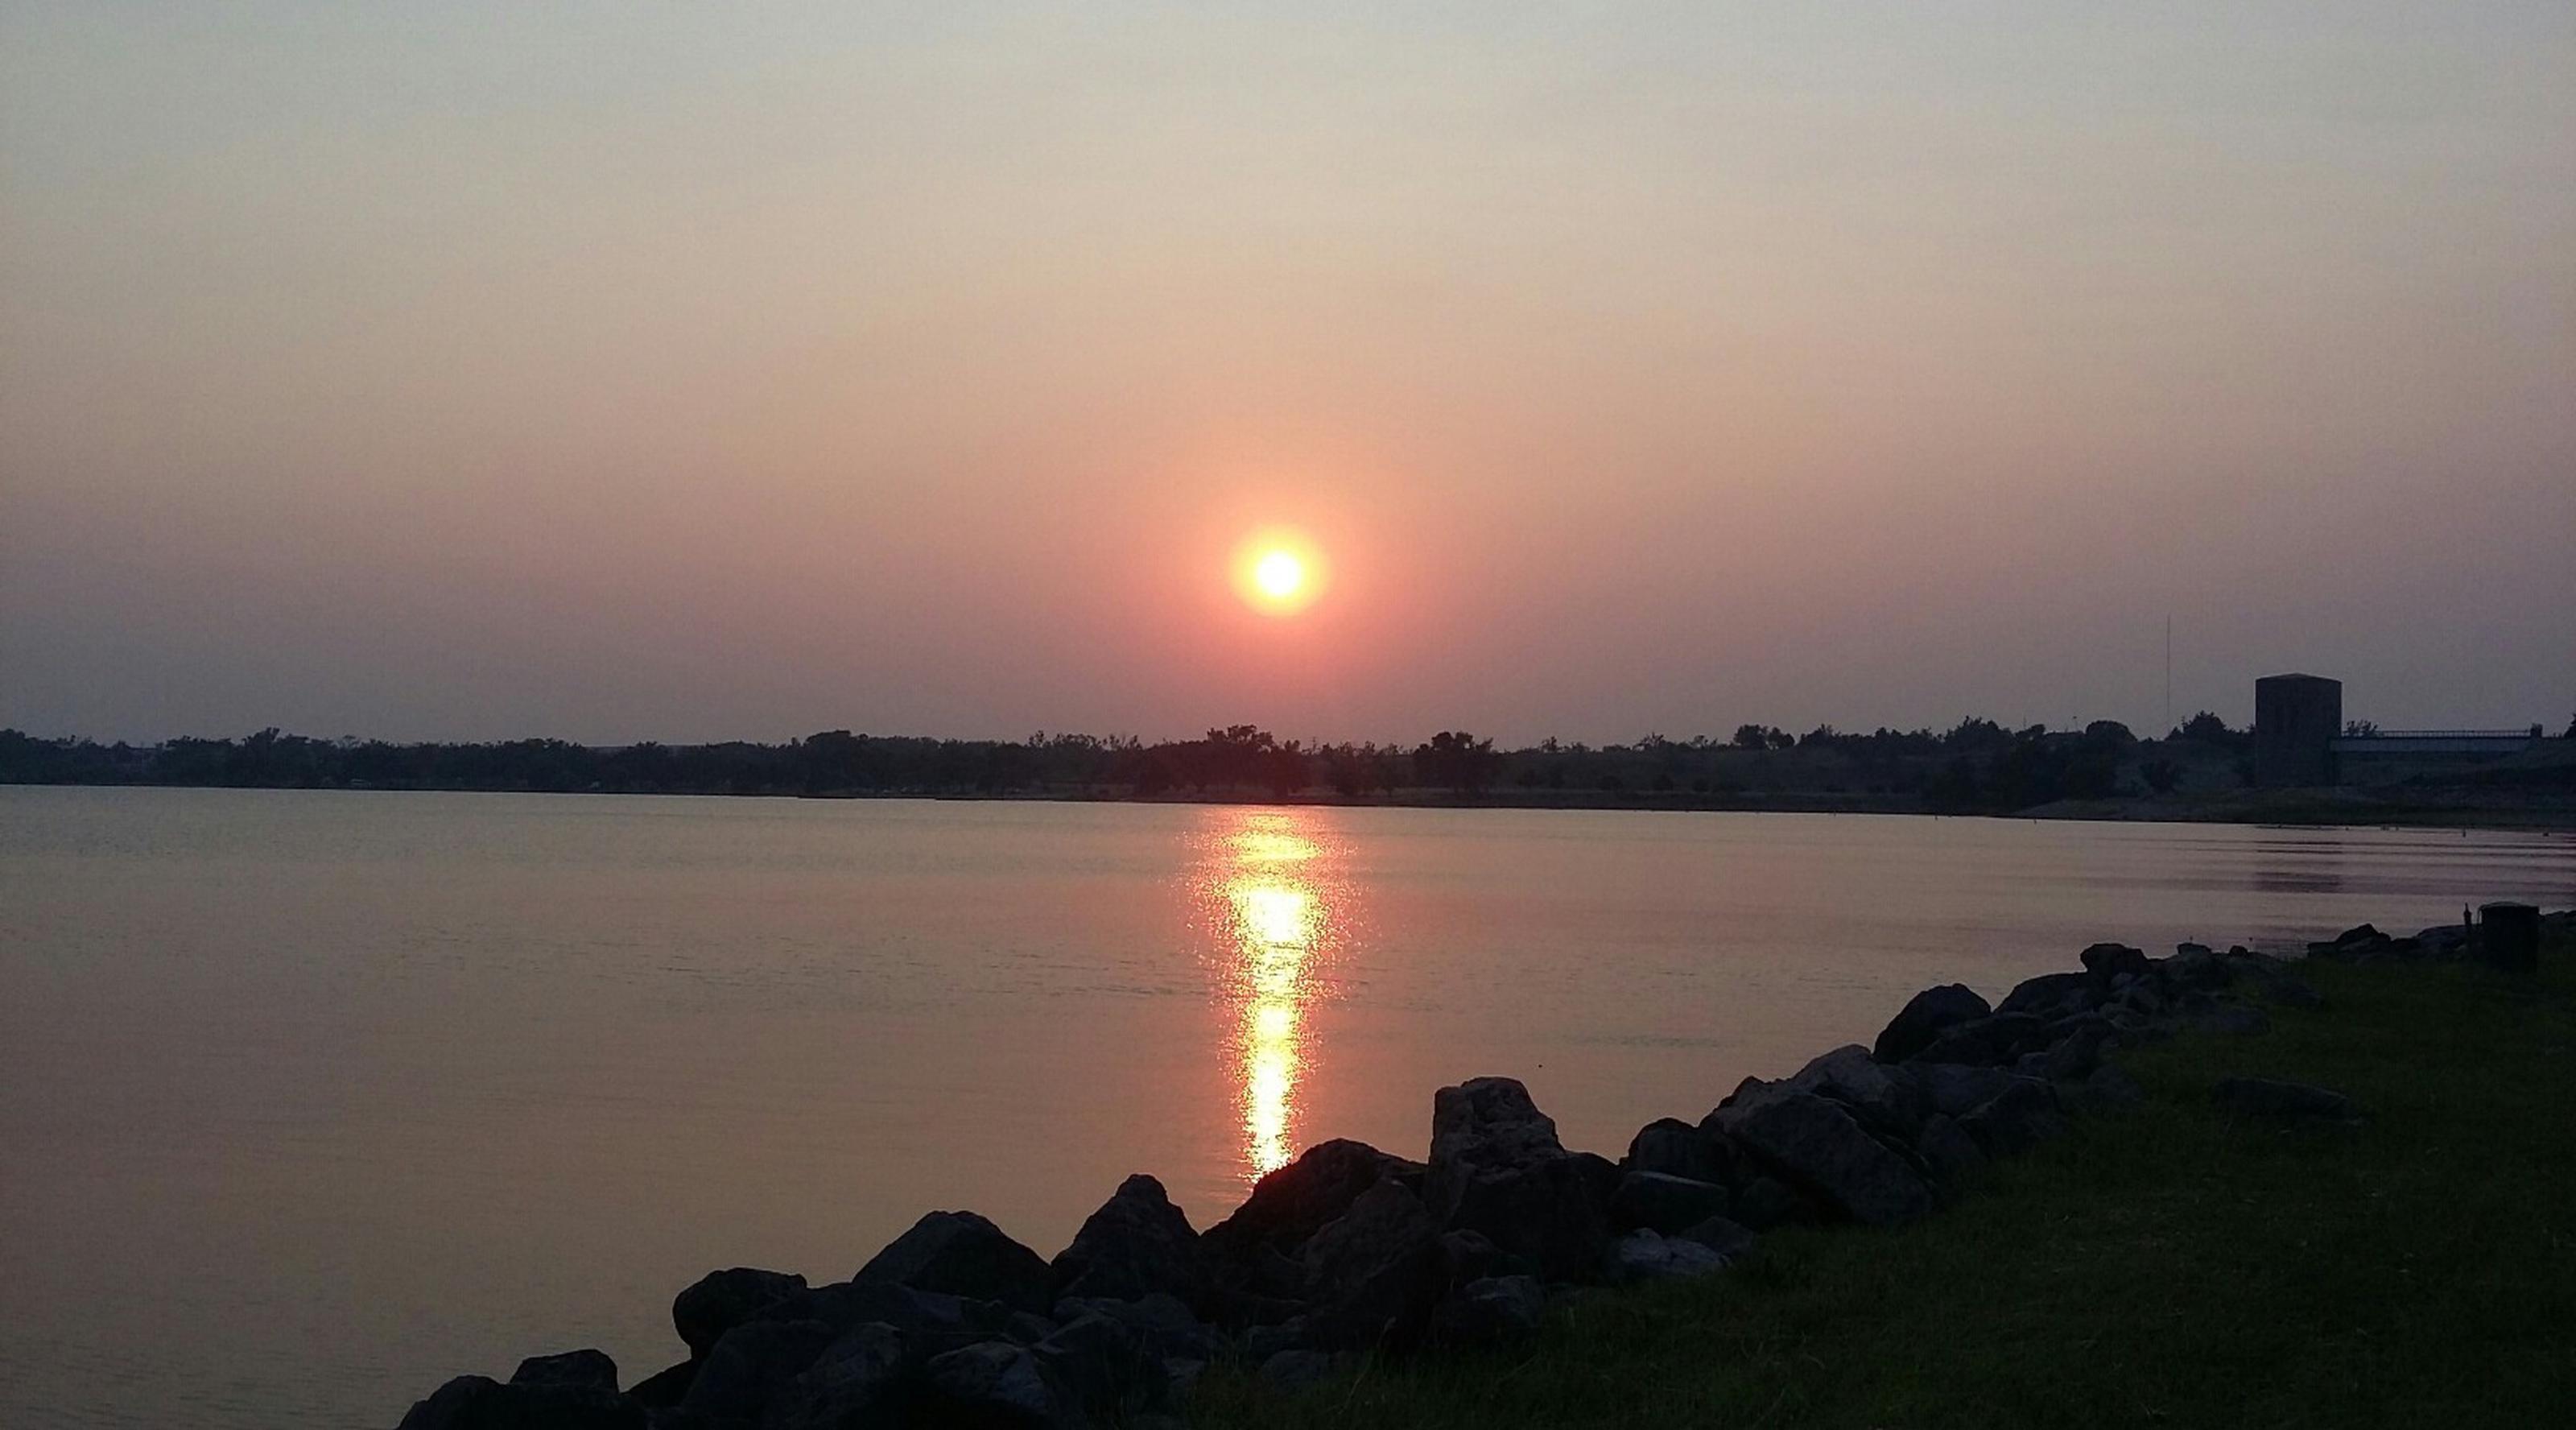 Lakeside Drive at sunsetSunset over Ft. Supply Lake